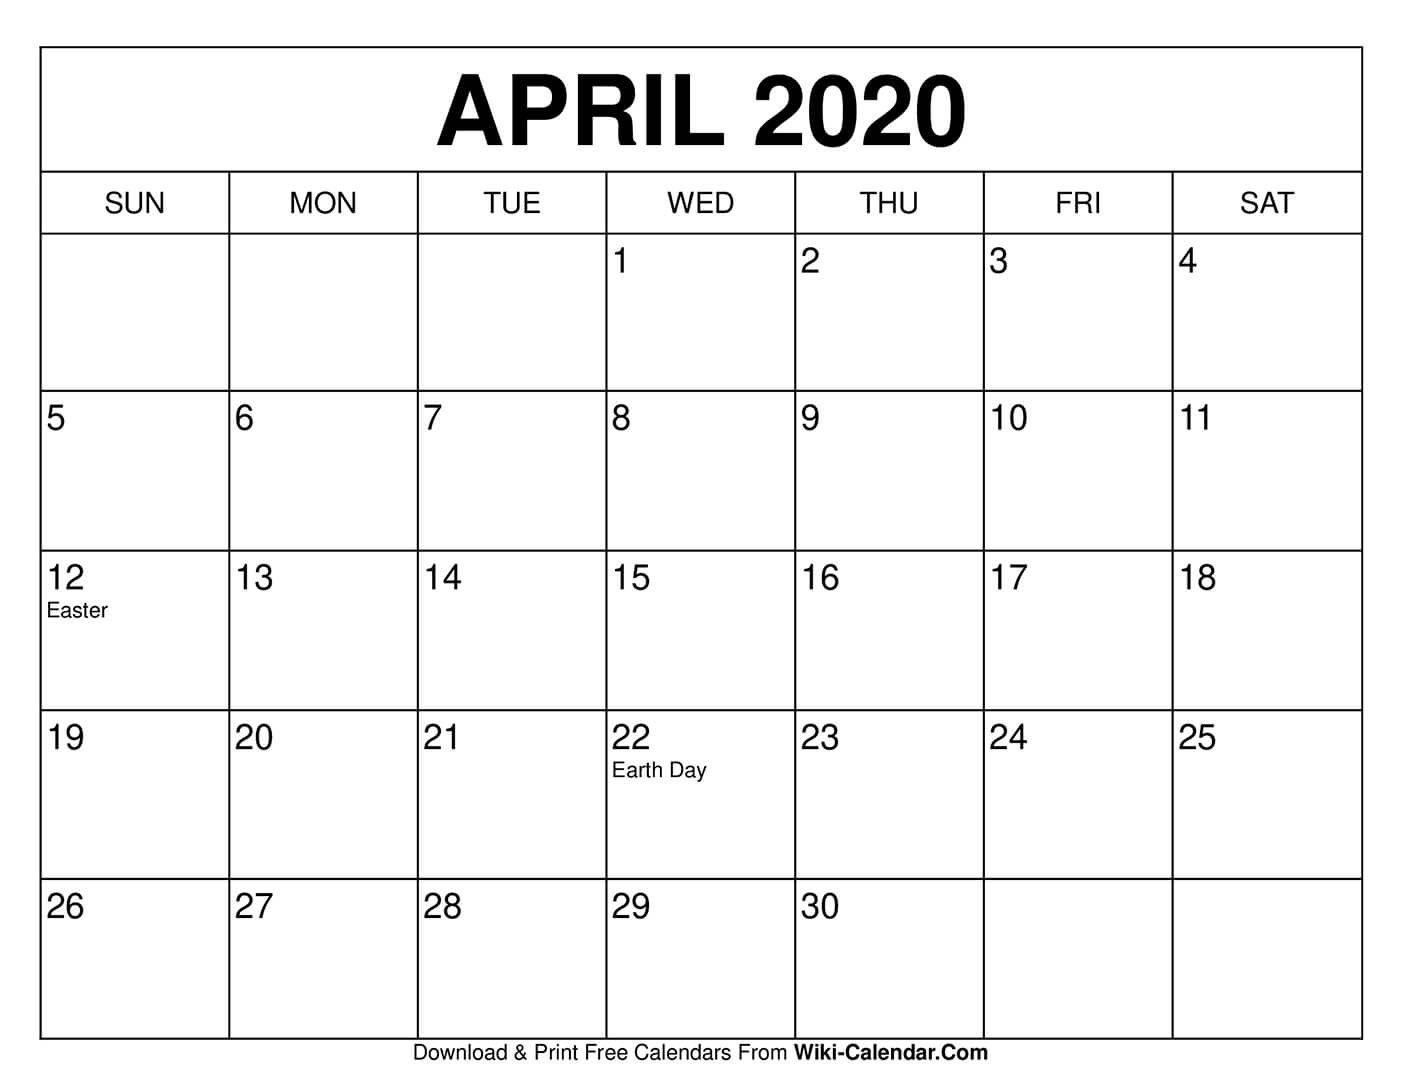 Free Printable April 2020 Calendars Calendar I Can Download And Edit